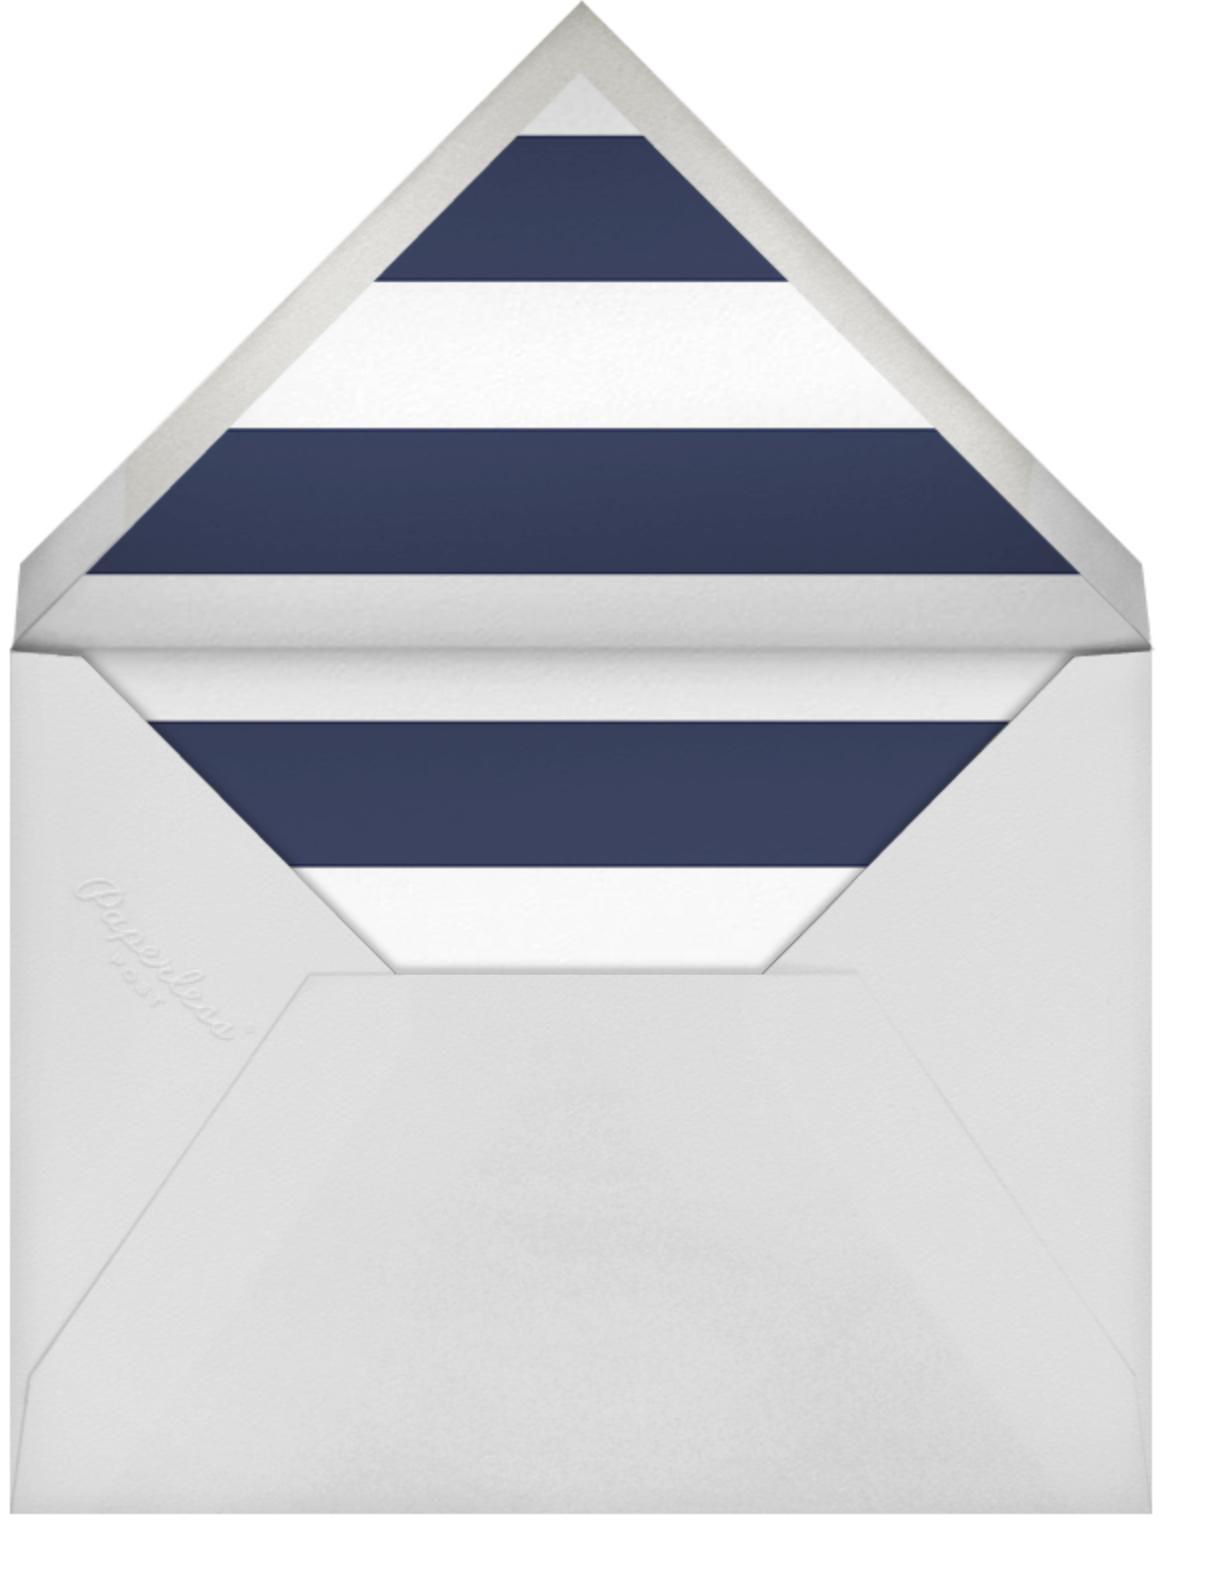 Nautical II (Stationery) - White - kate spade new york - Personalized stationery - envelope back